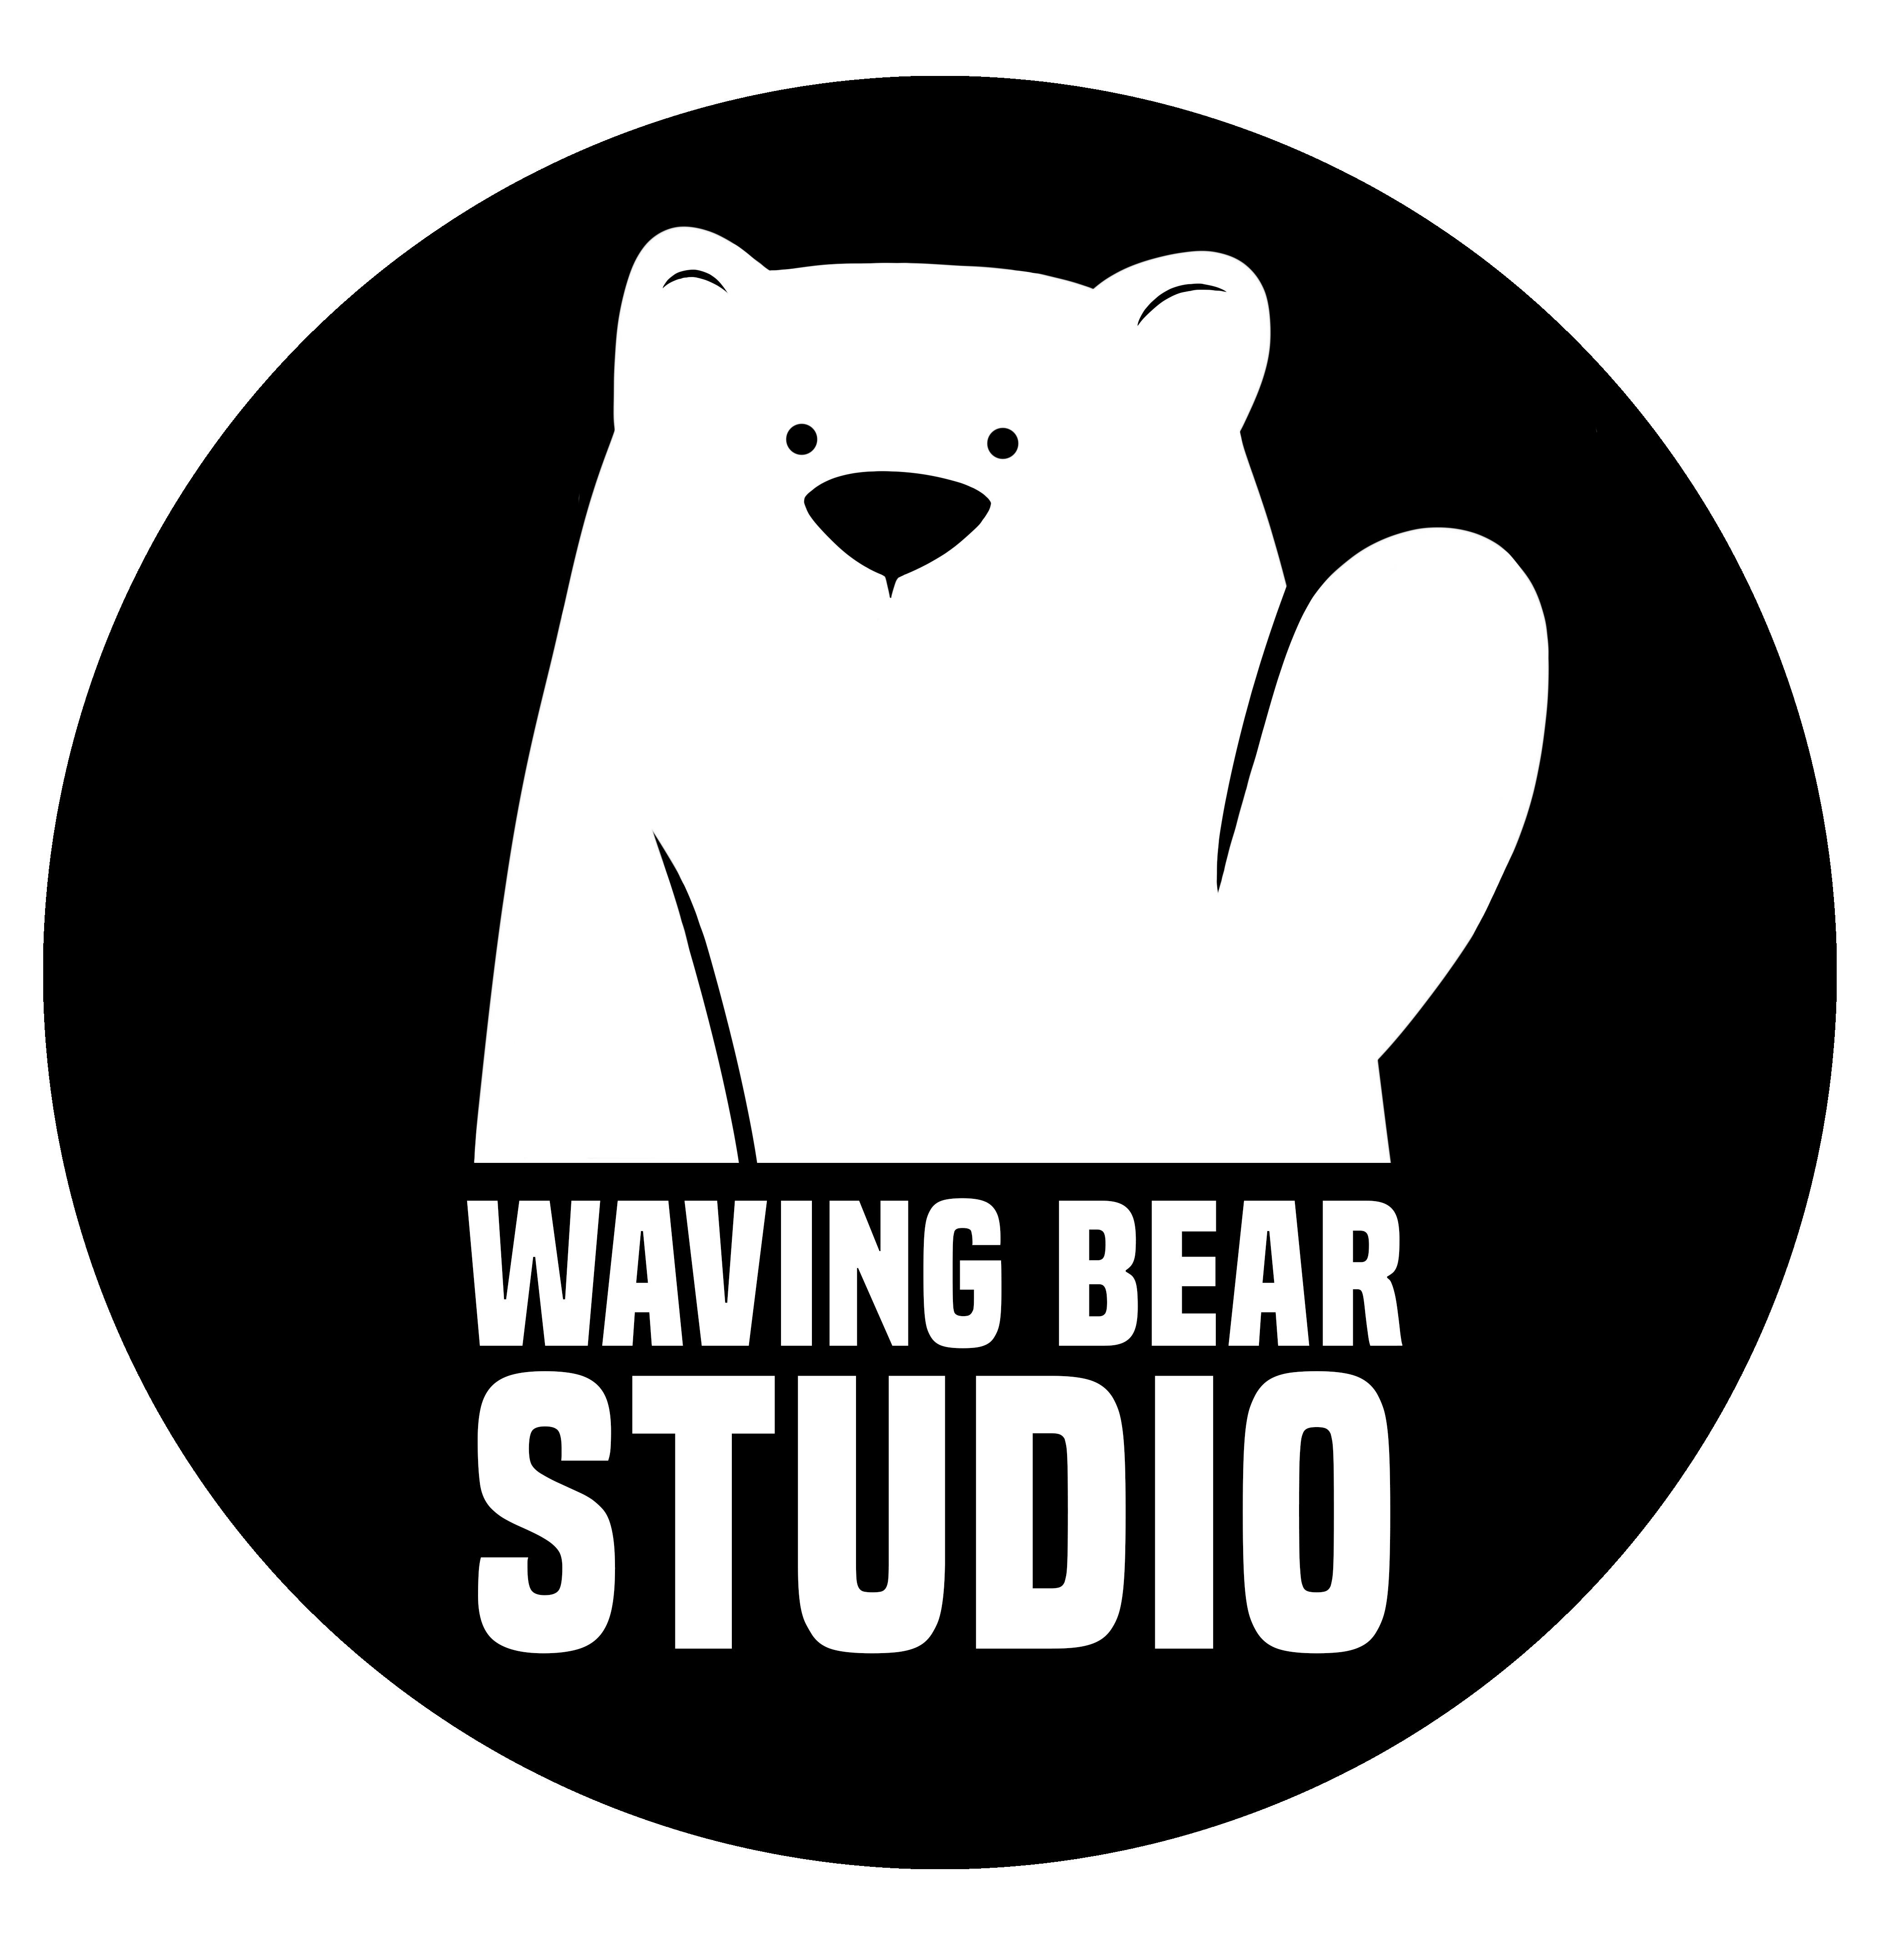 Waving Bear Studio